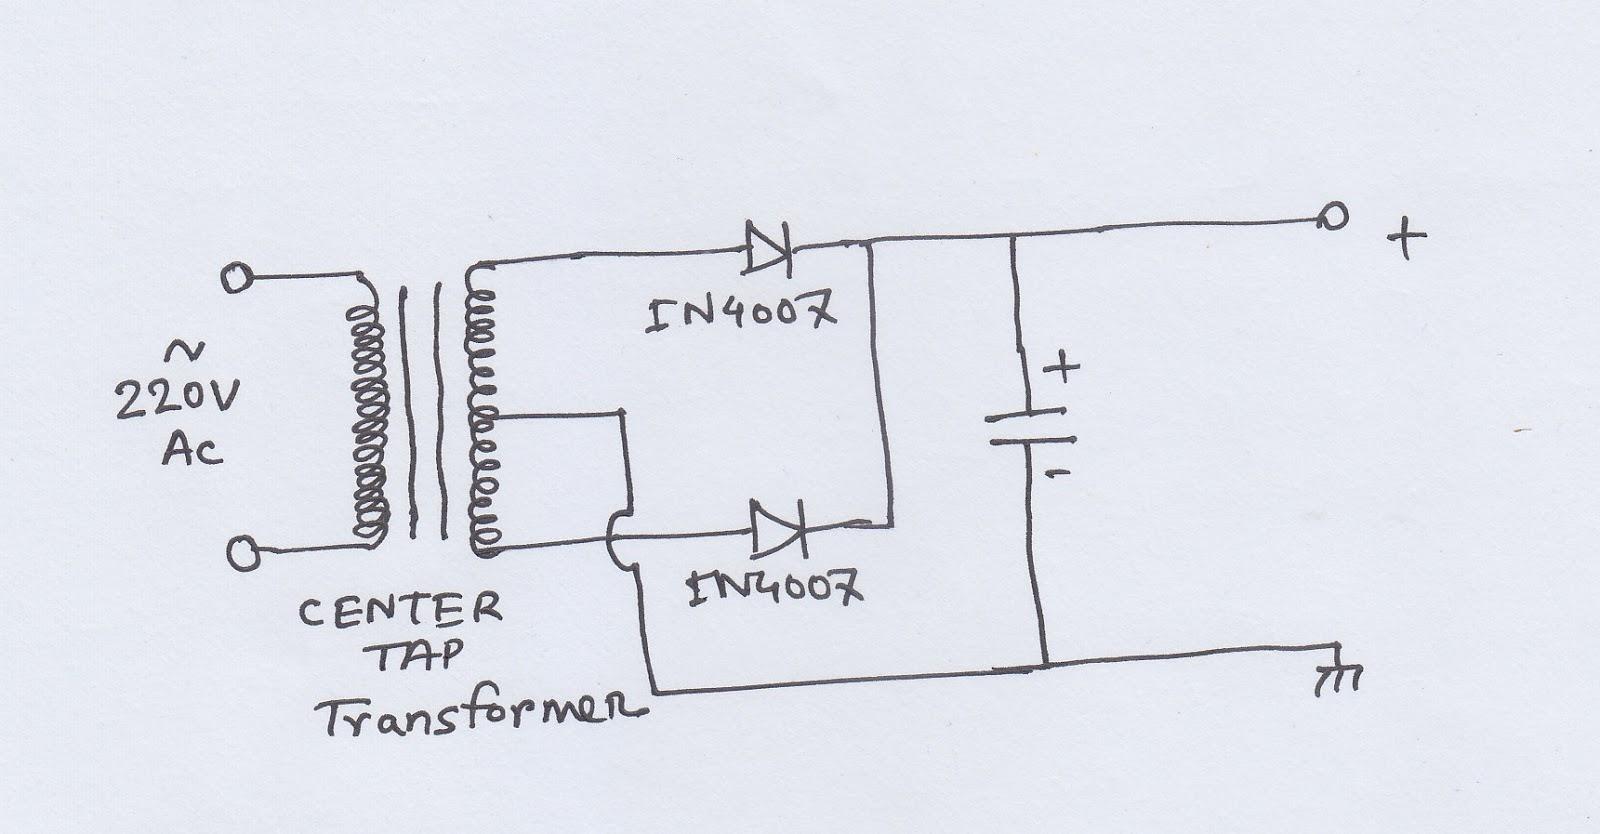 220v to 12v transformer wiring diagram 1999 chevy silverado brake line scavenger 39s blog ac dc circuit 1 hobby electronics